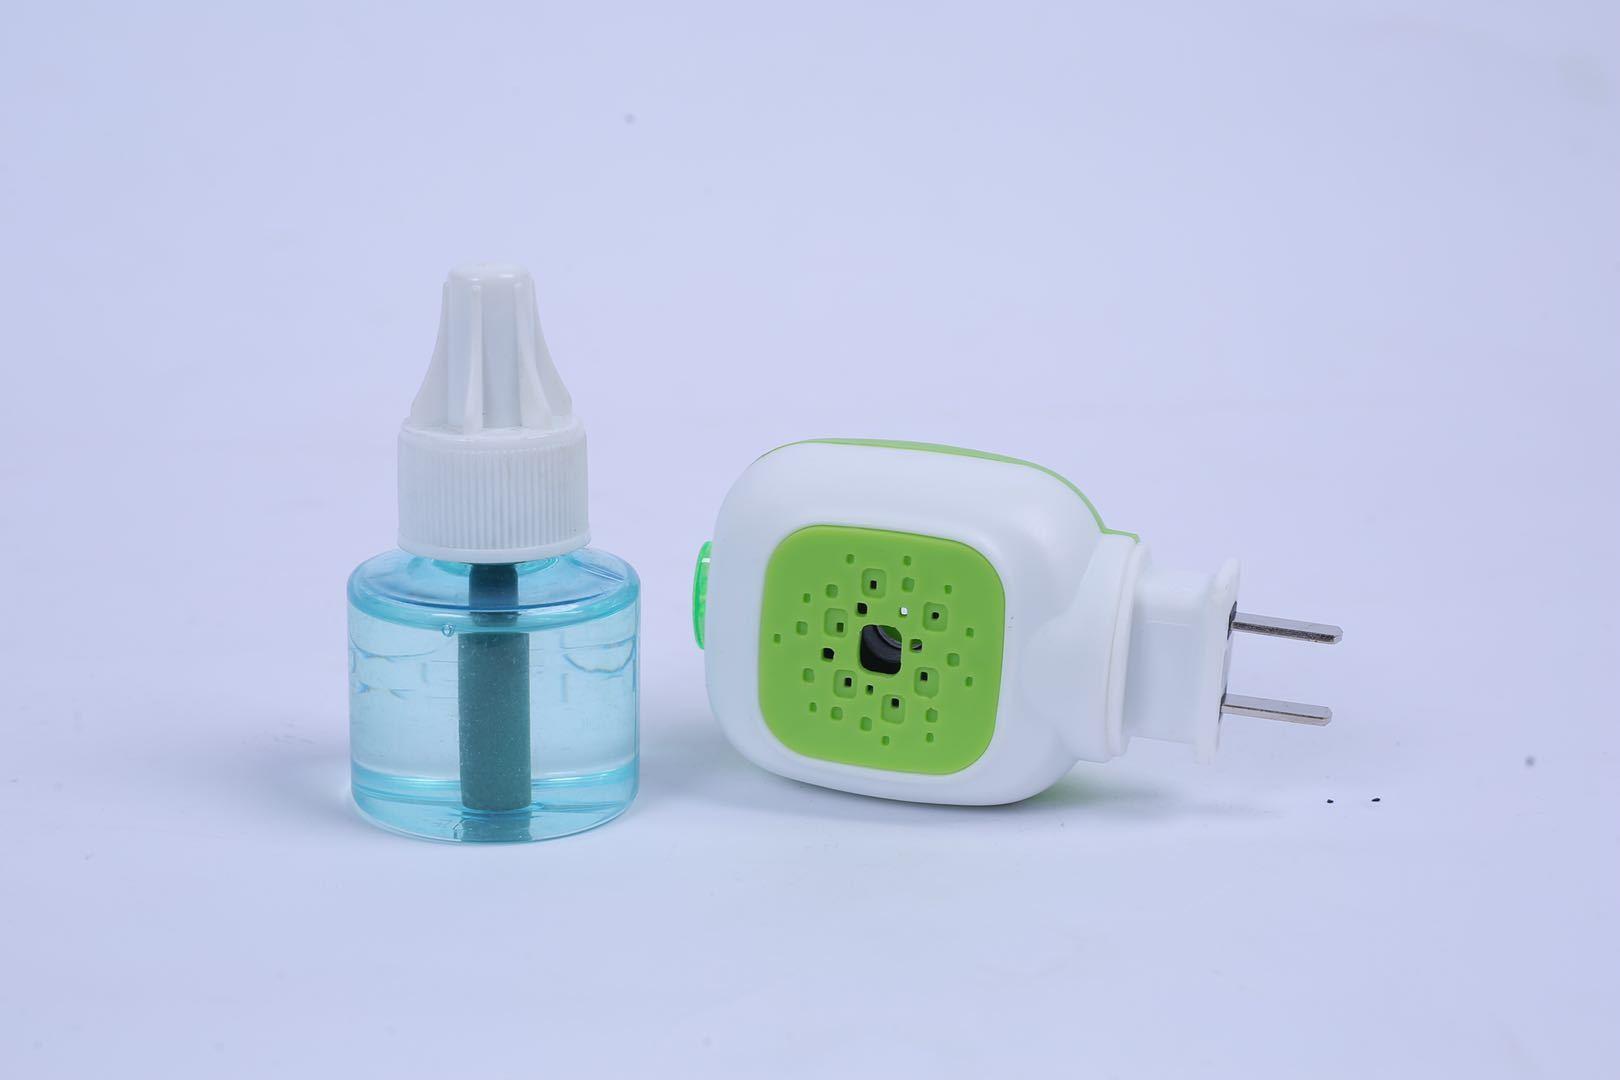 Powerful Eco-friendly Electric Mosquito Repellent Liquid